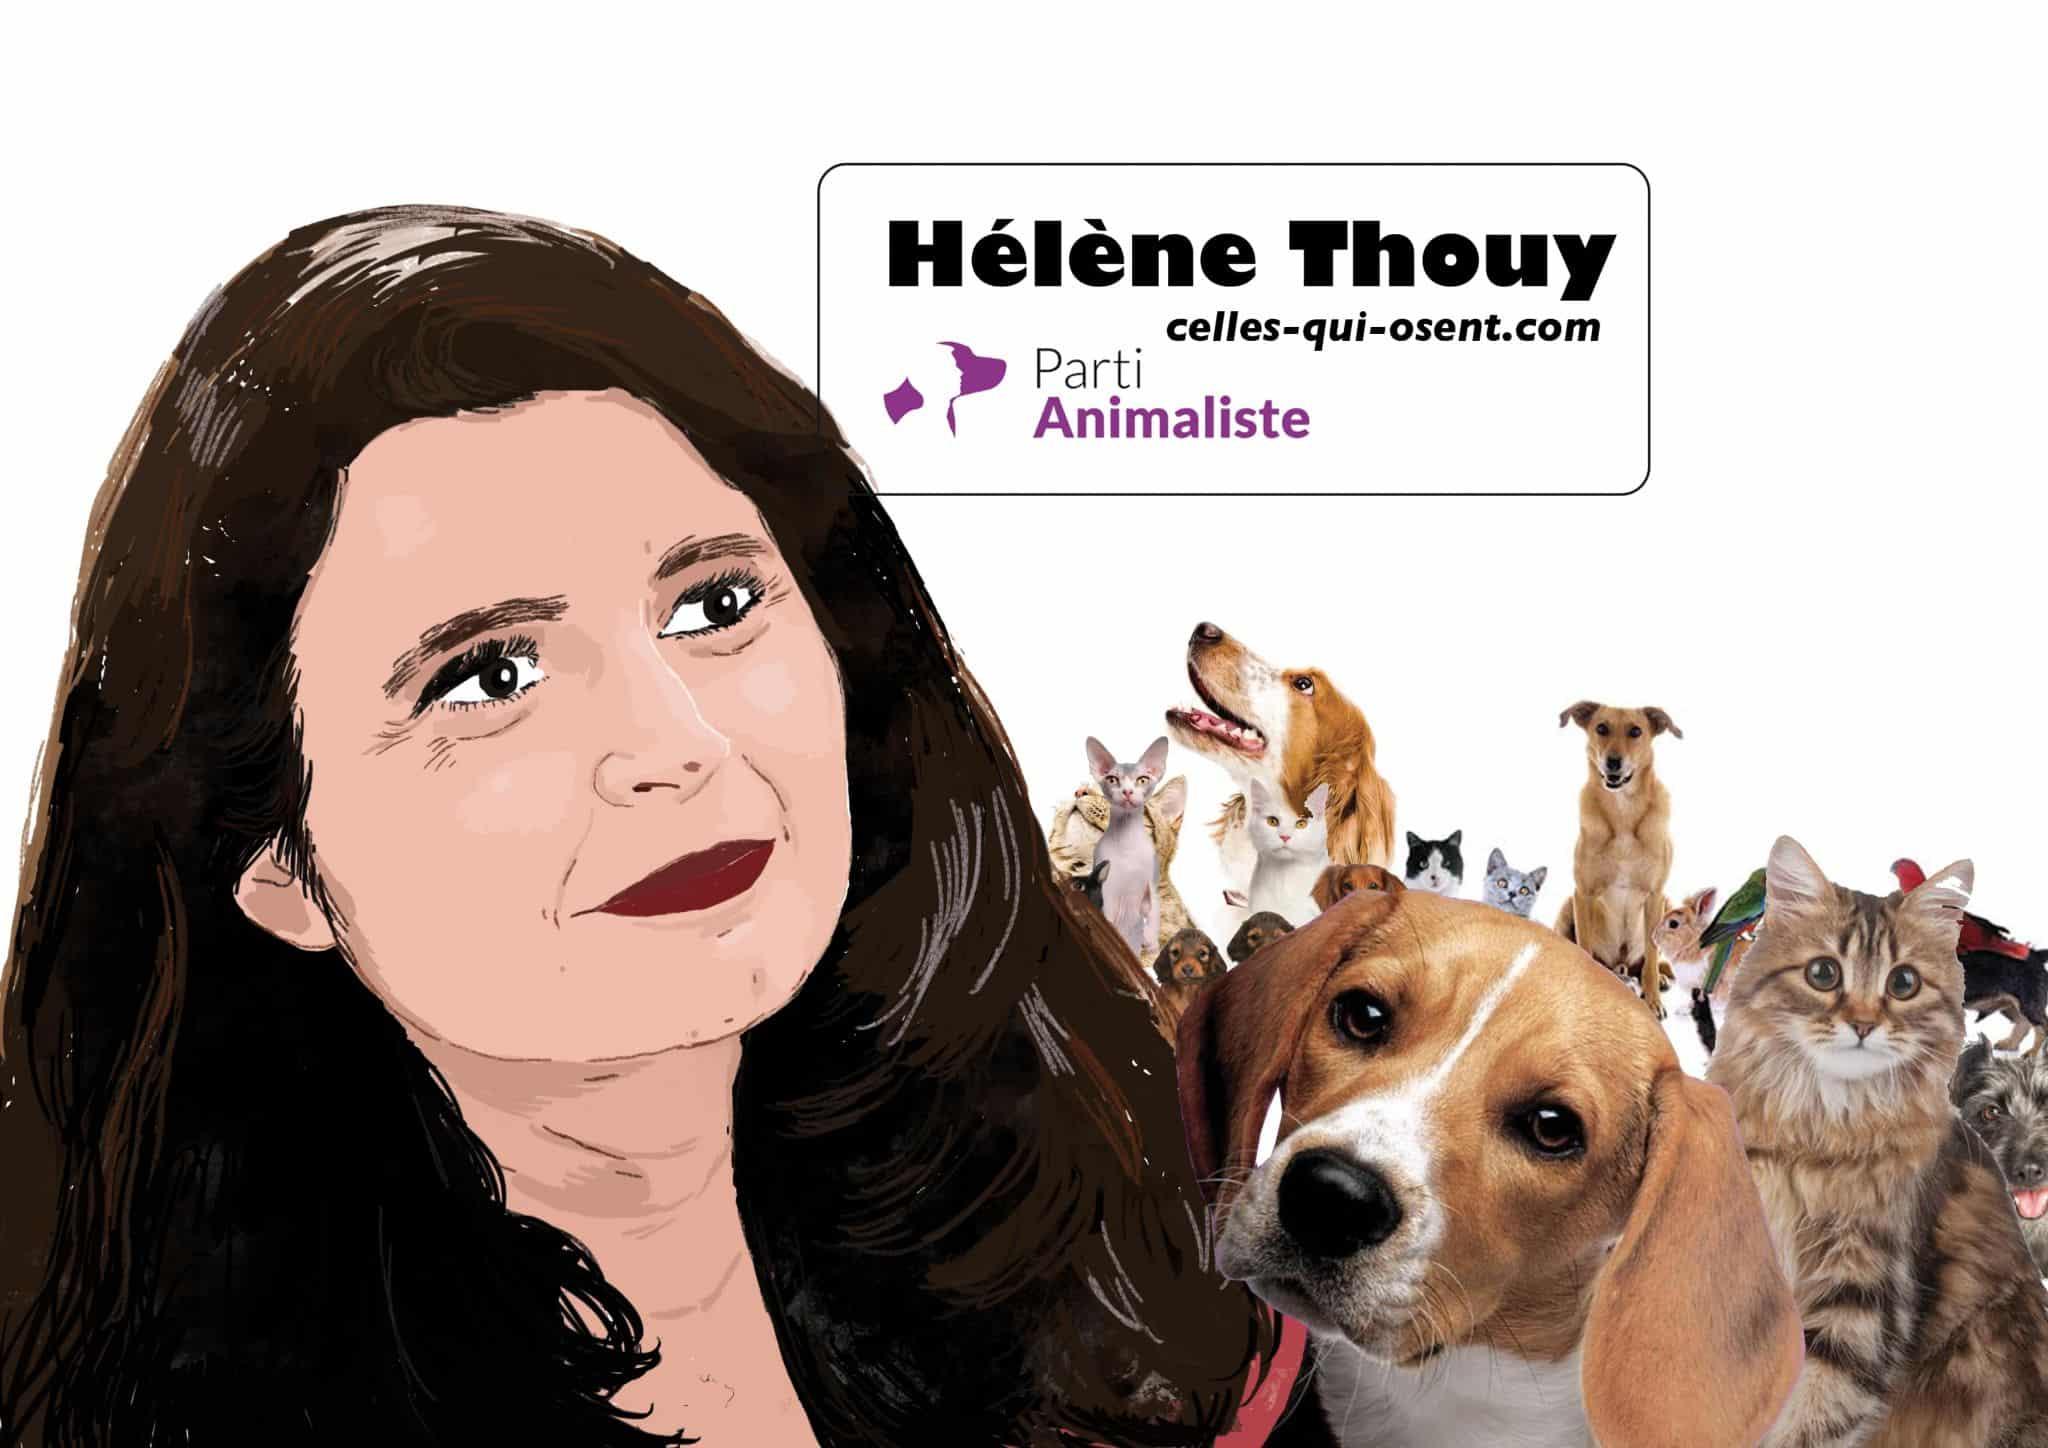 helene-thouy-parti-animaliste-celles-qui-osent-CQO